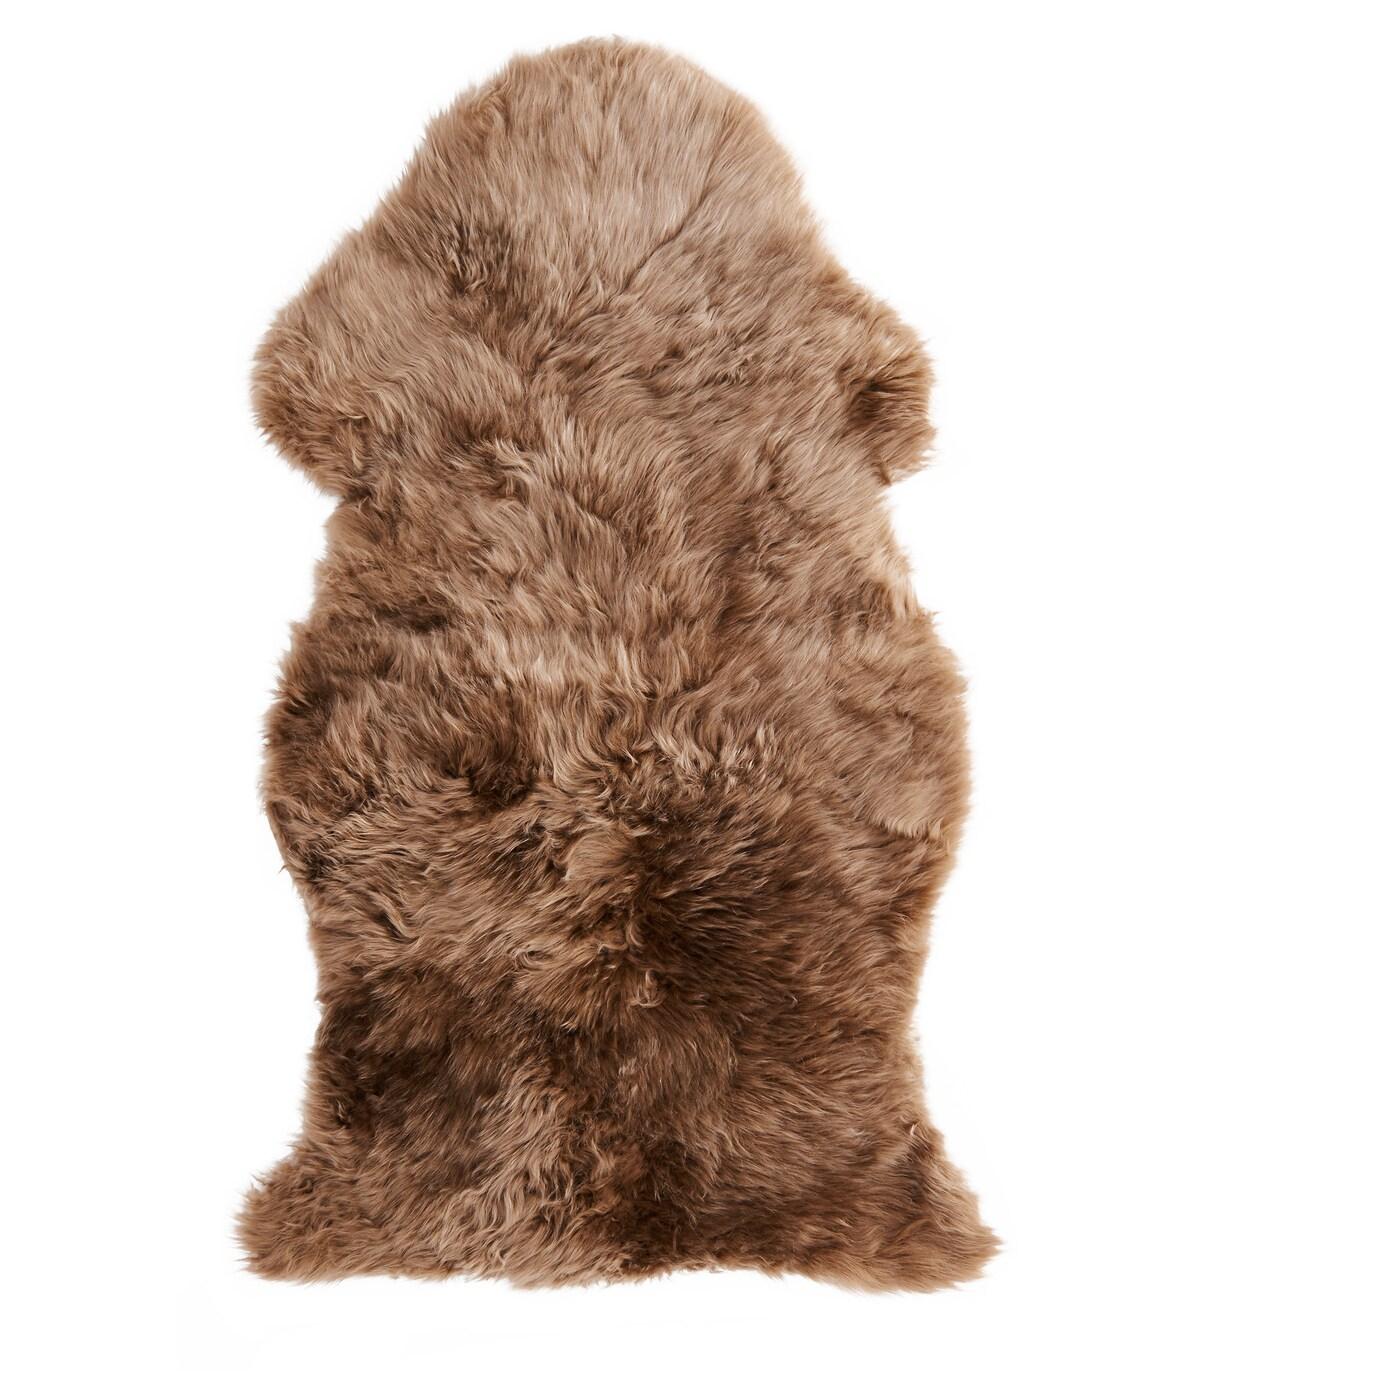 Peau De Mouton Grise Ikea skold peau de mouton - beige 90 cm